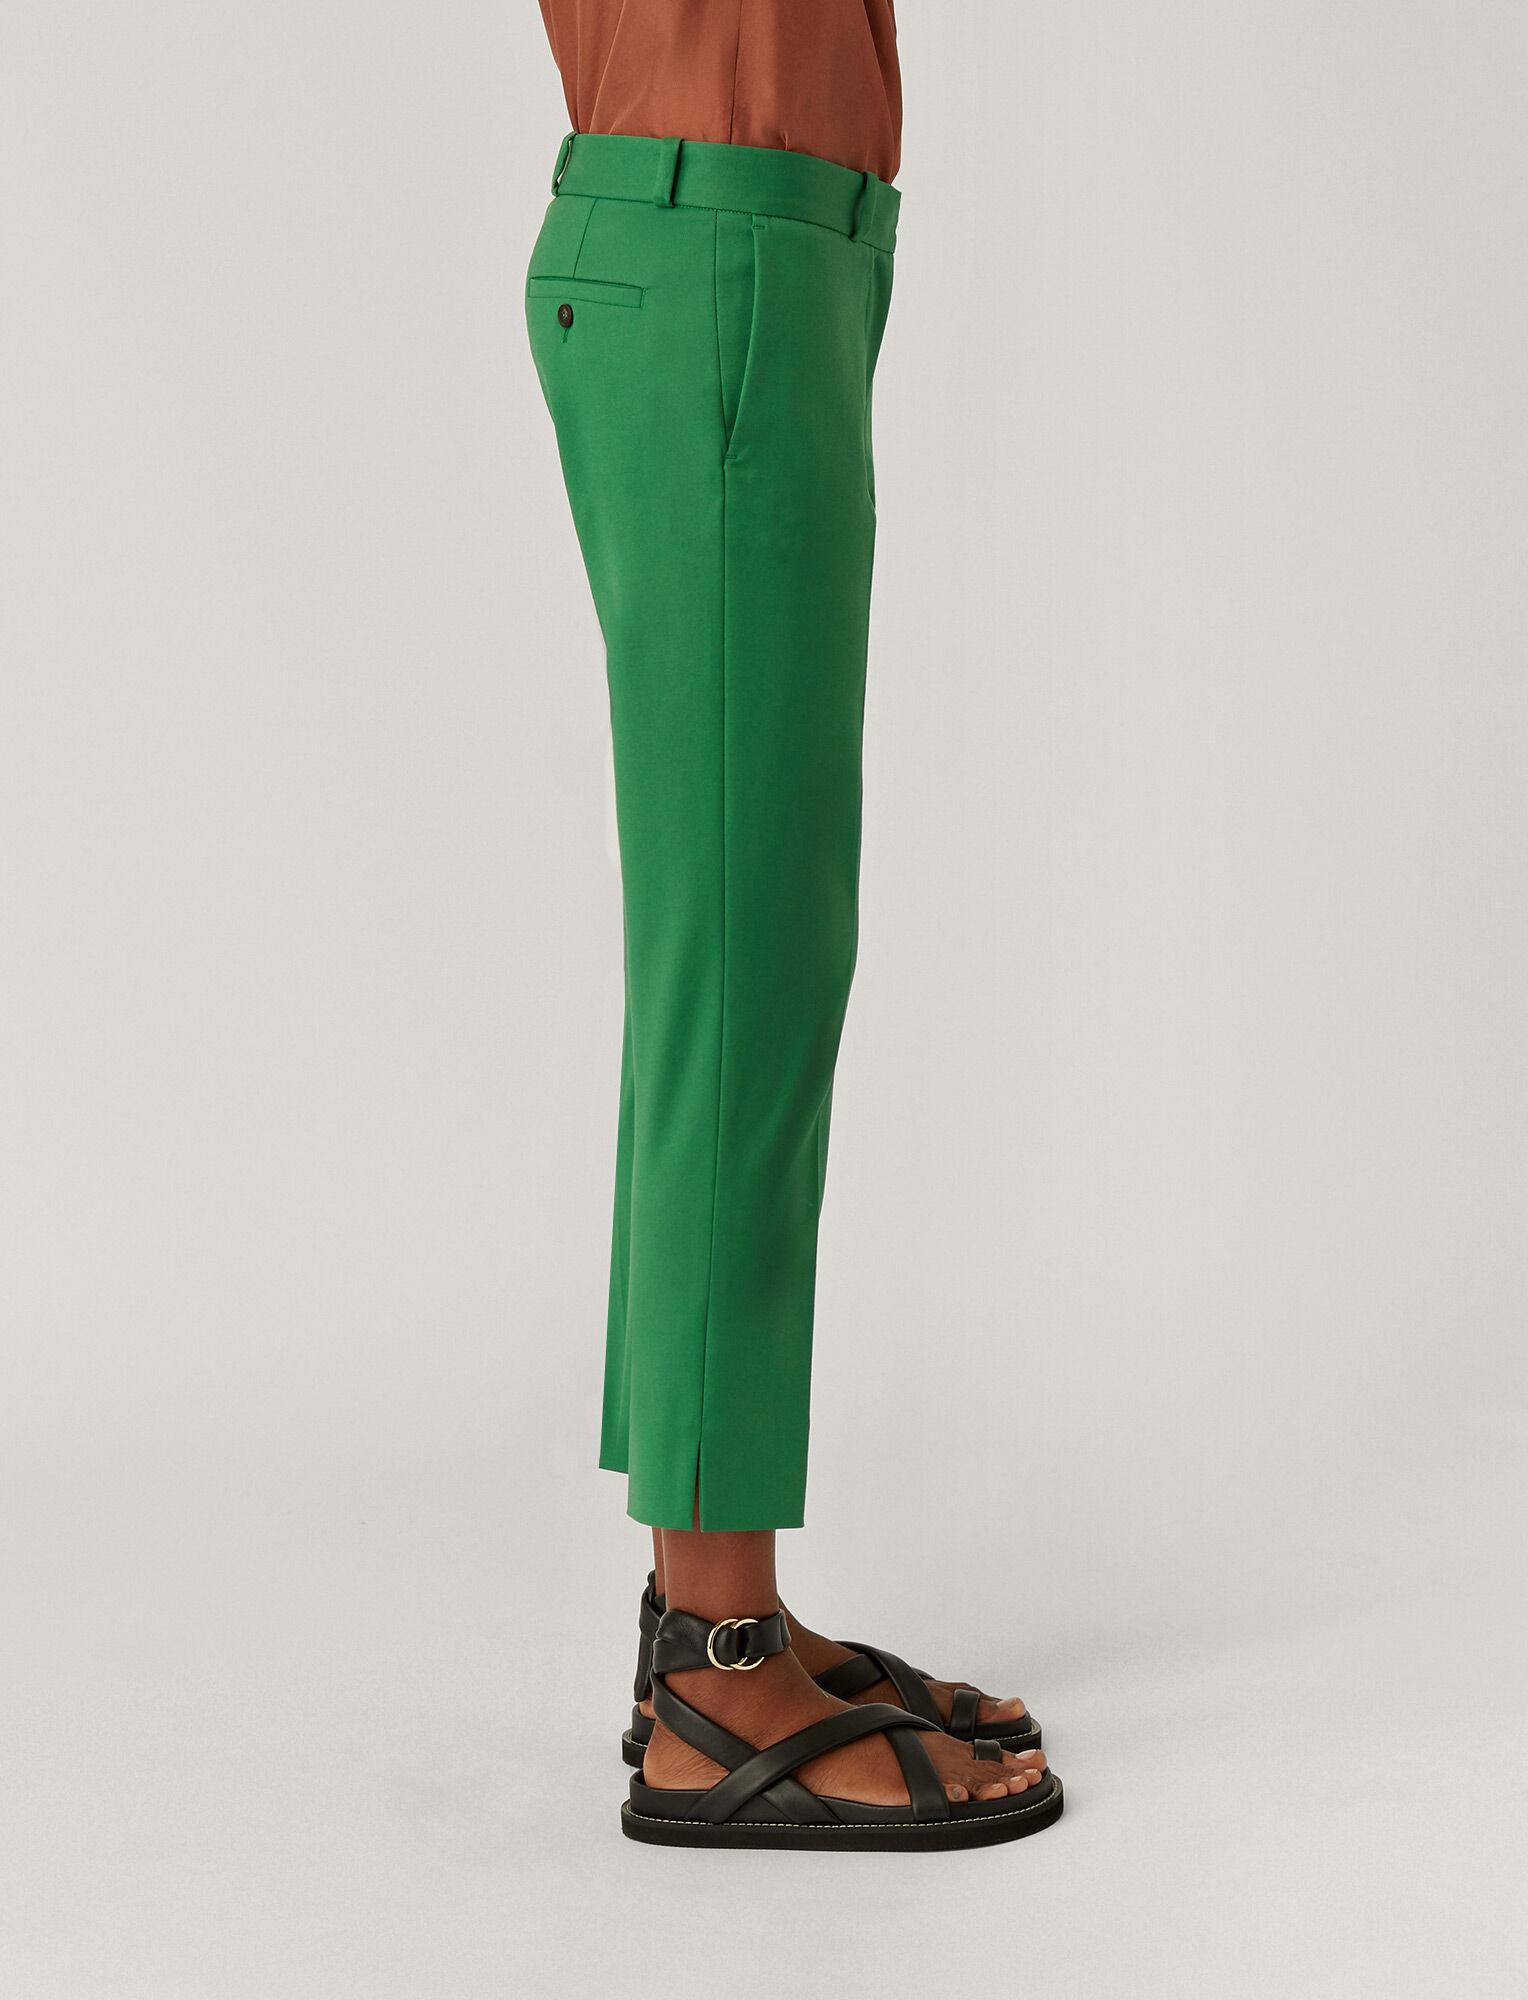 Joseph, Bing Court Double Cotton Stretch Trousers, in AMAZON